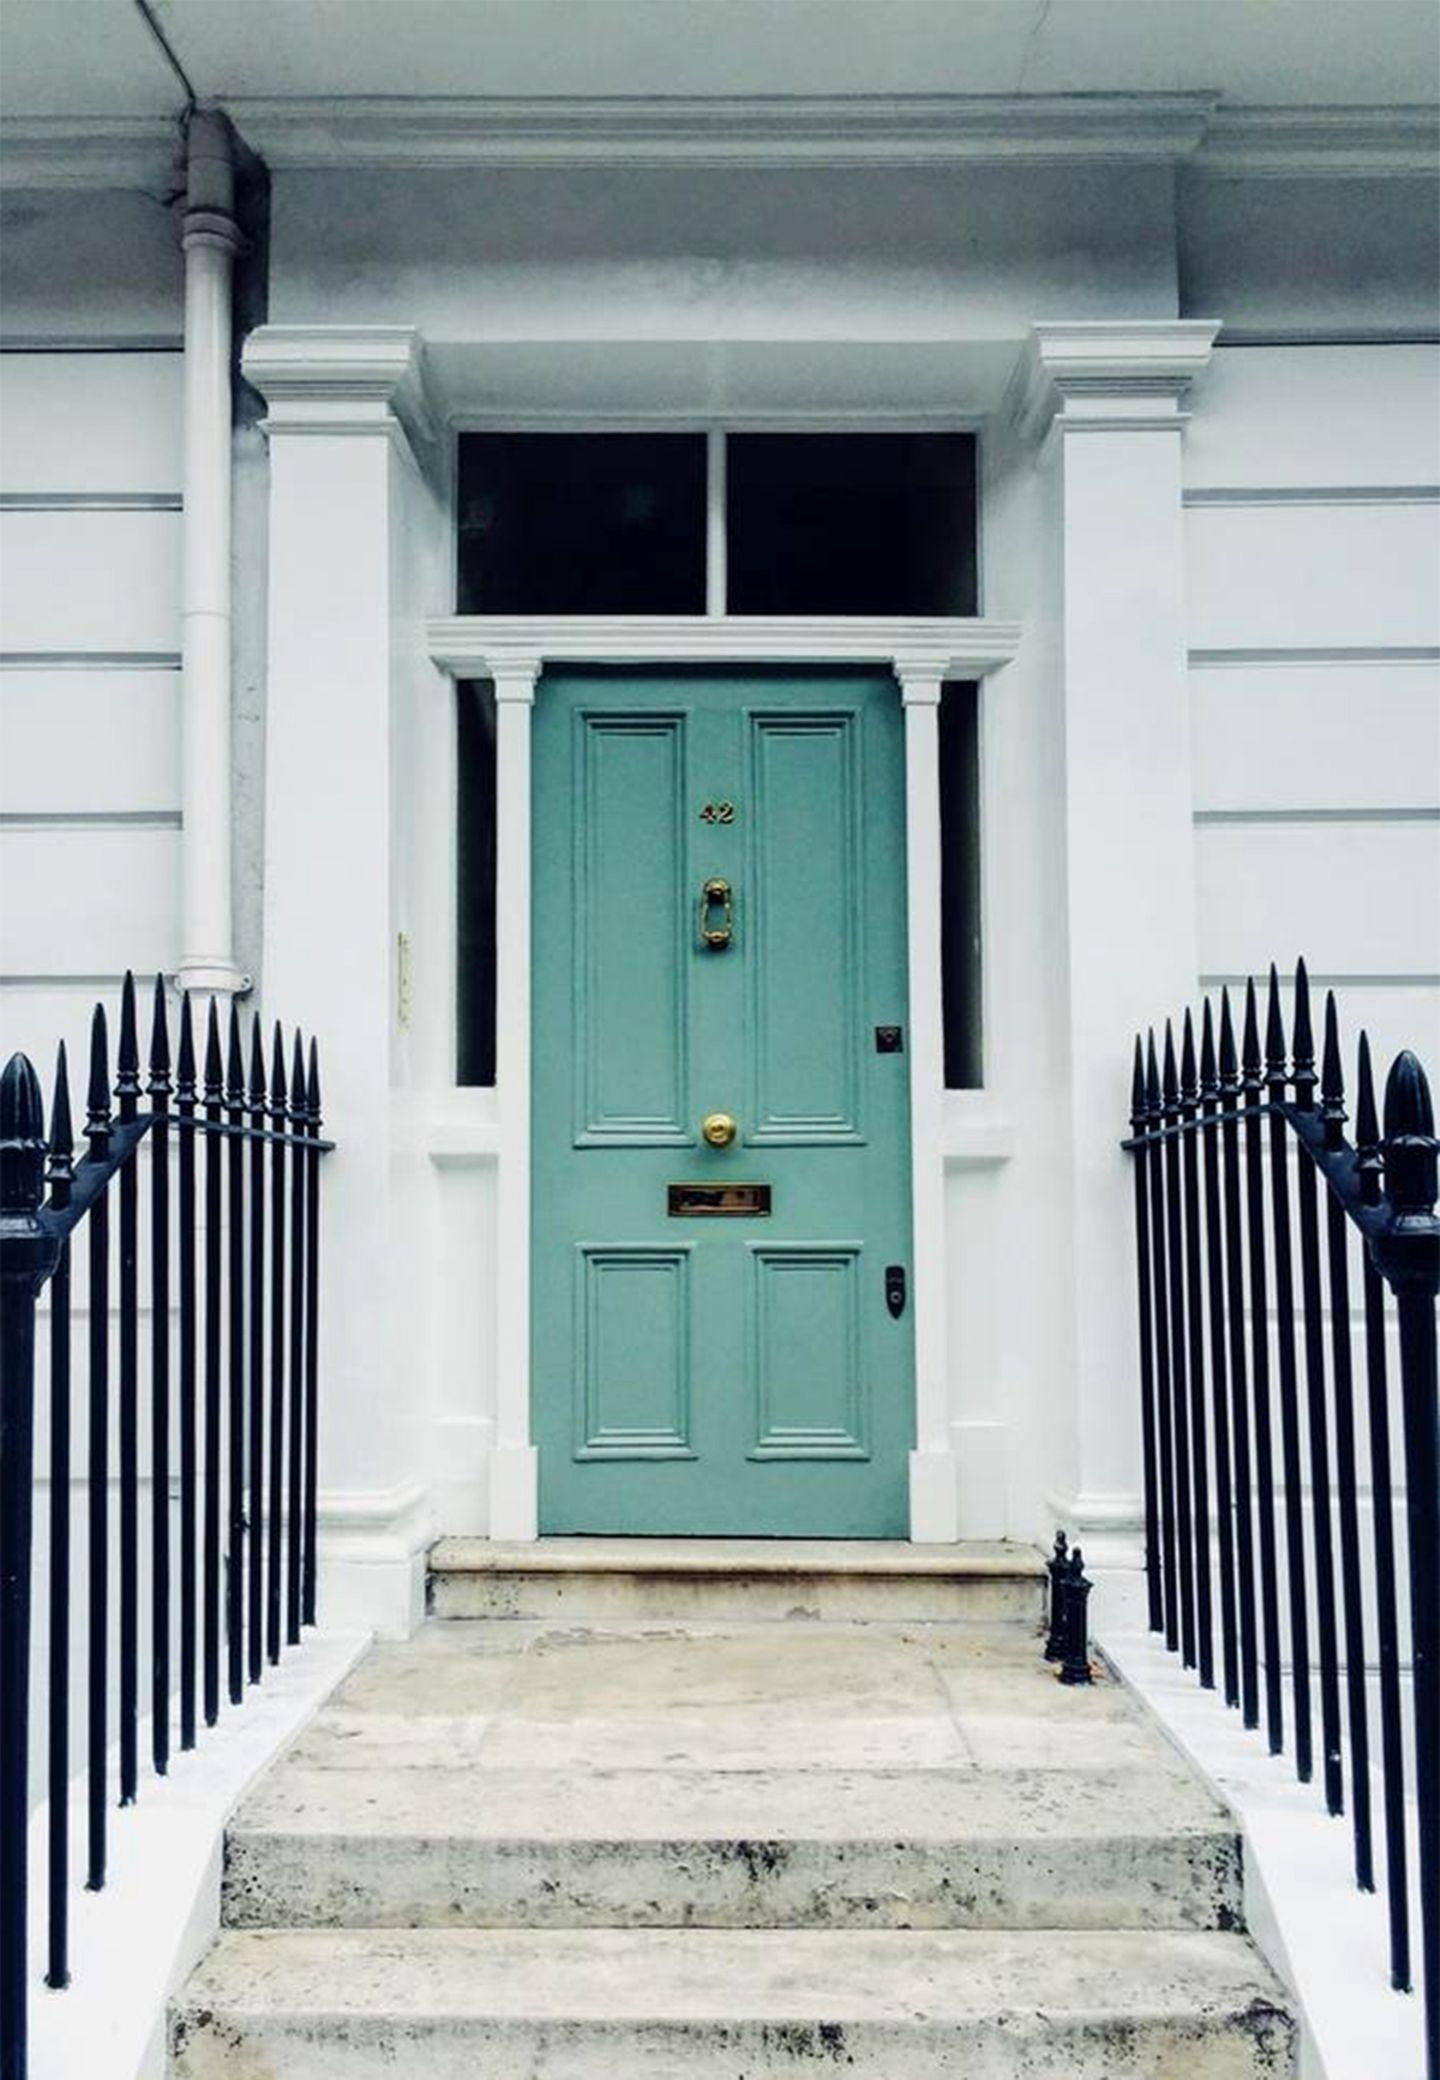 Haustür Türkis Grün London